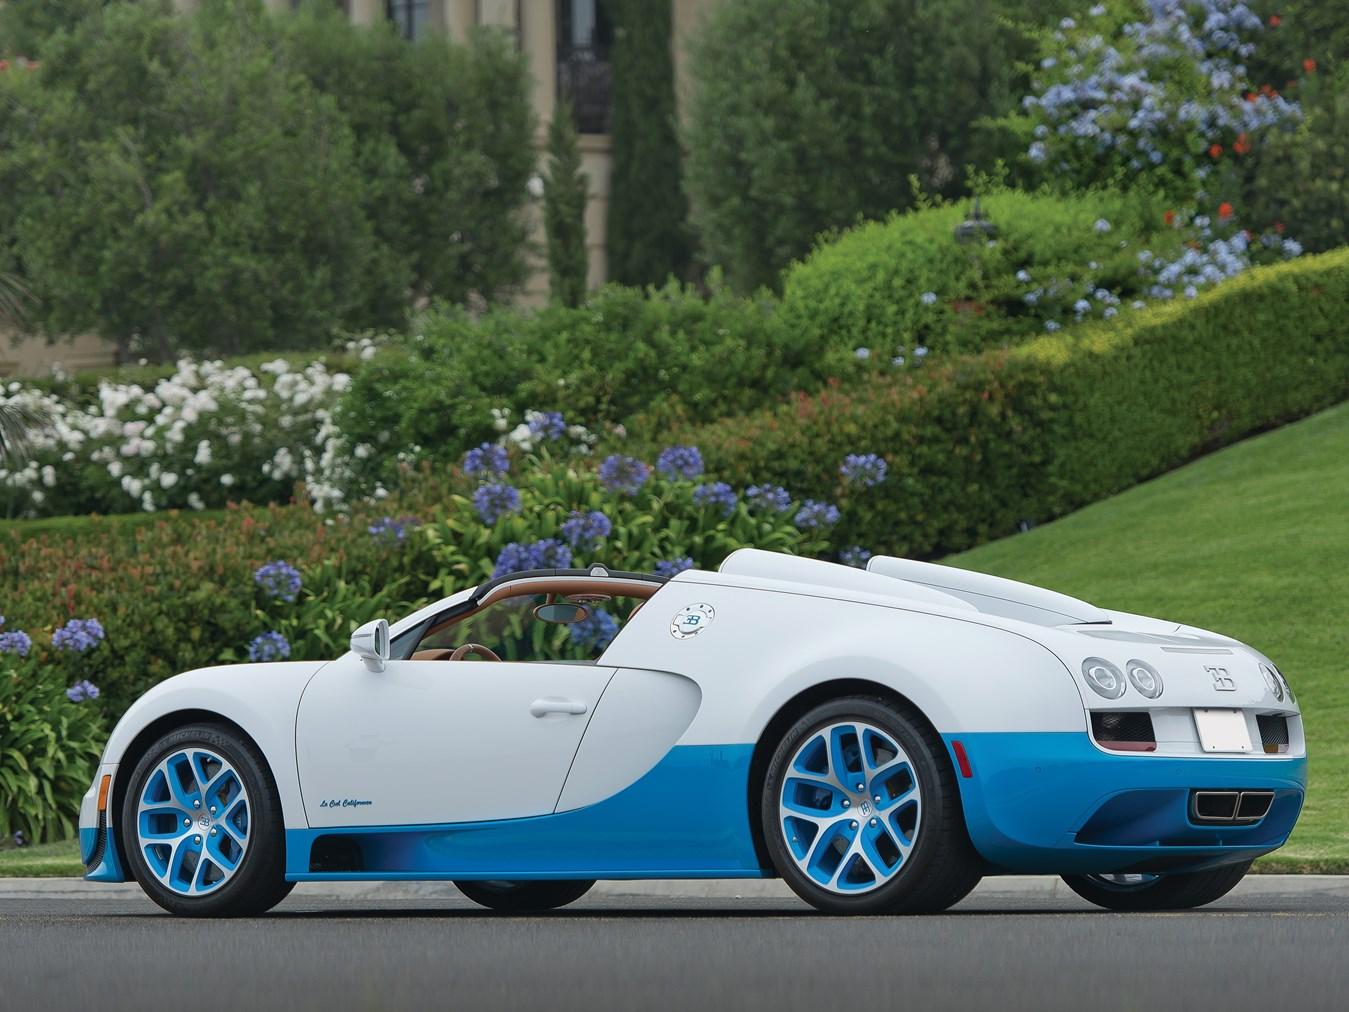 2013 Bugatti Veyron 16.4 Grand Sport Vitesse U0027Le Ciel Californienu0027